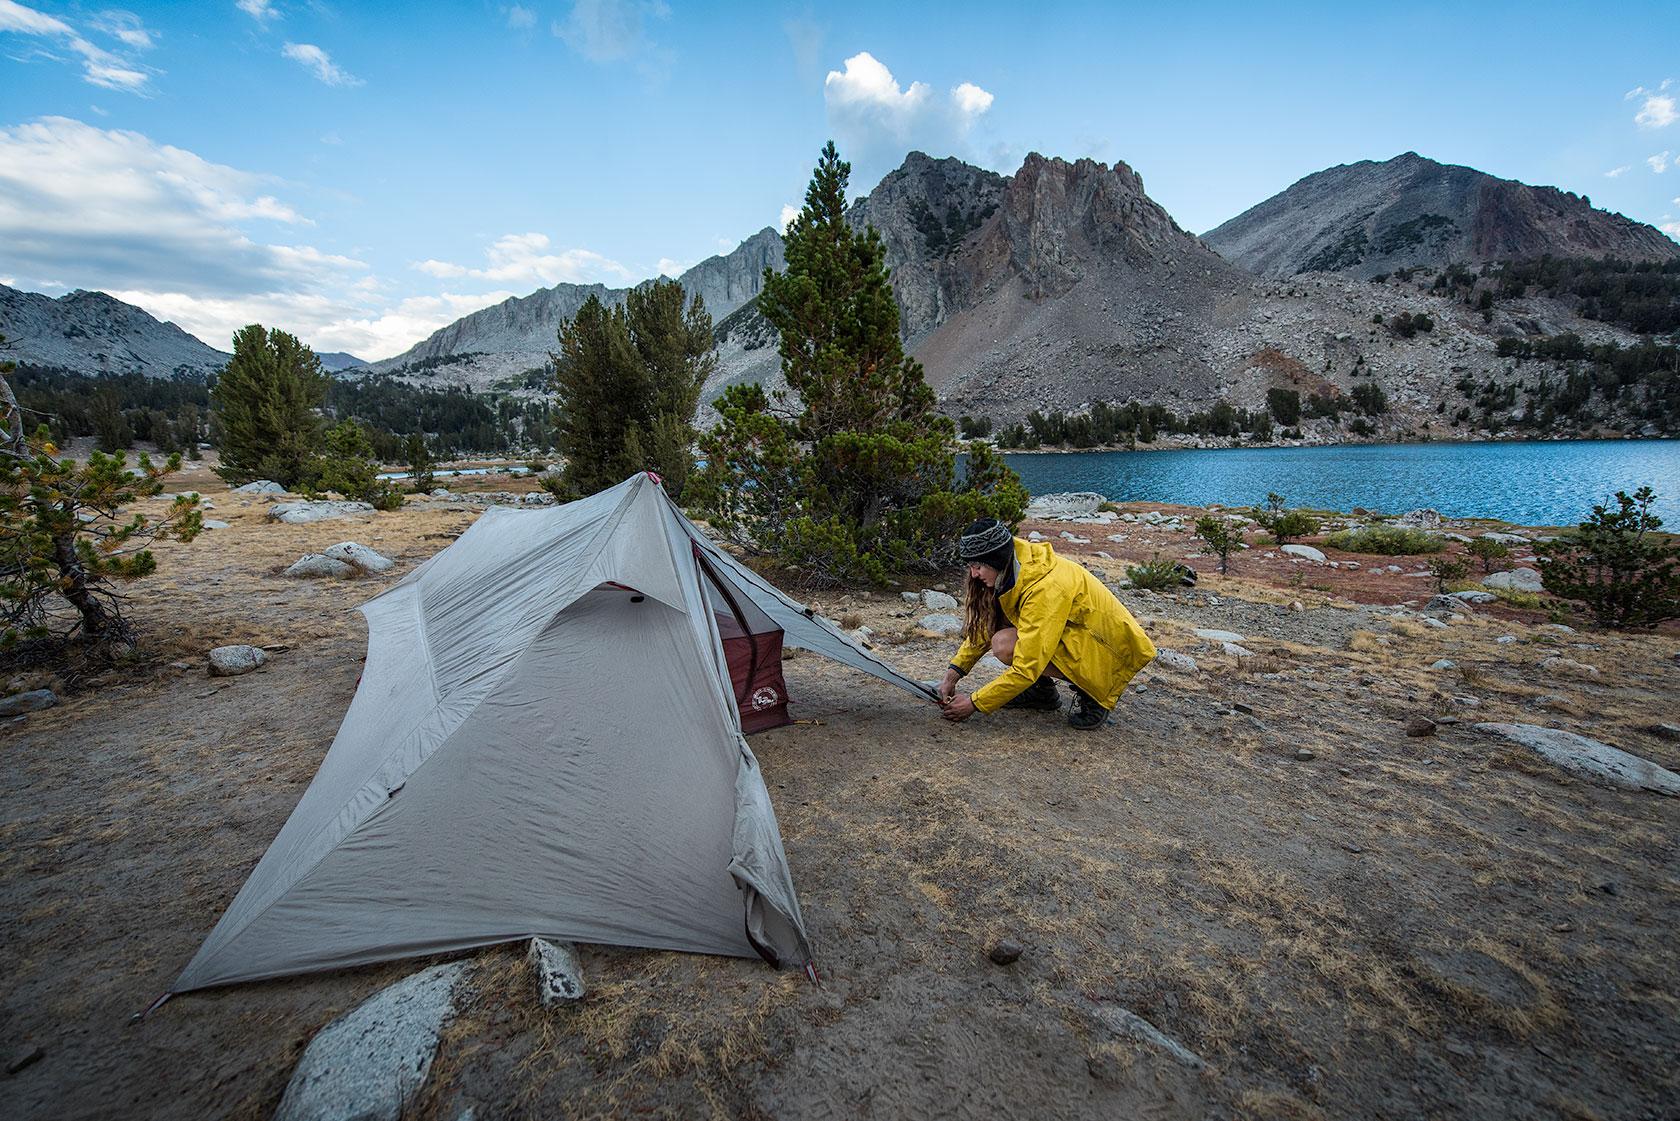 austin-trigg-big-agnes-tent-john-muir-trail-camping-Lake-Virgina-campsite.jpg